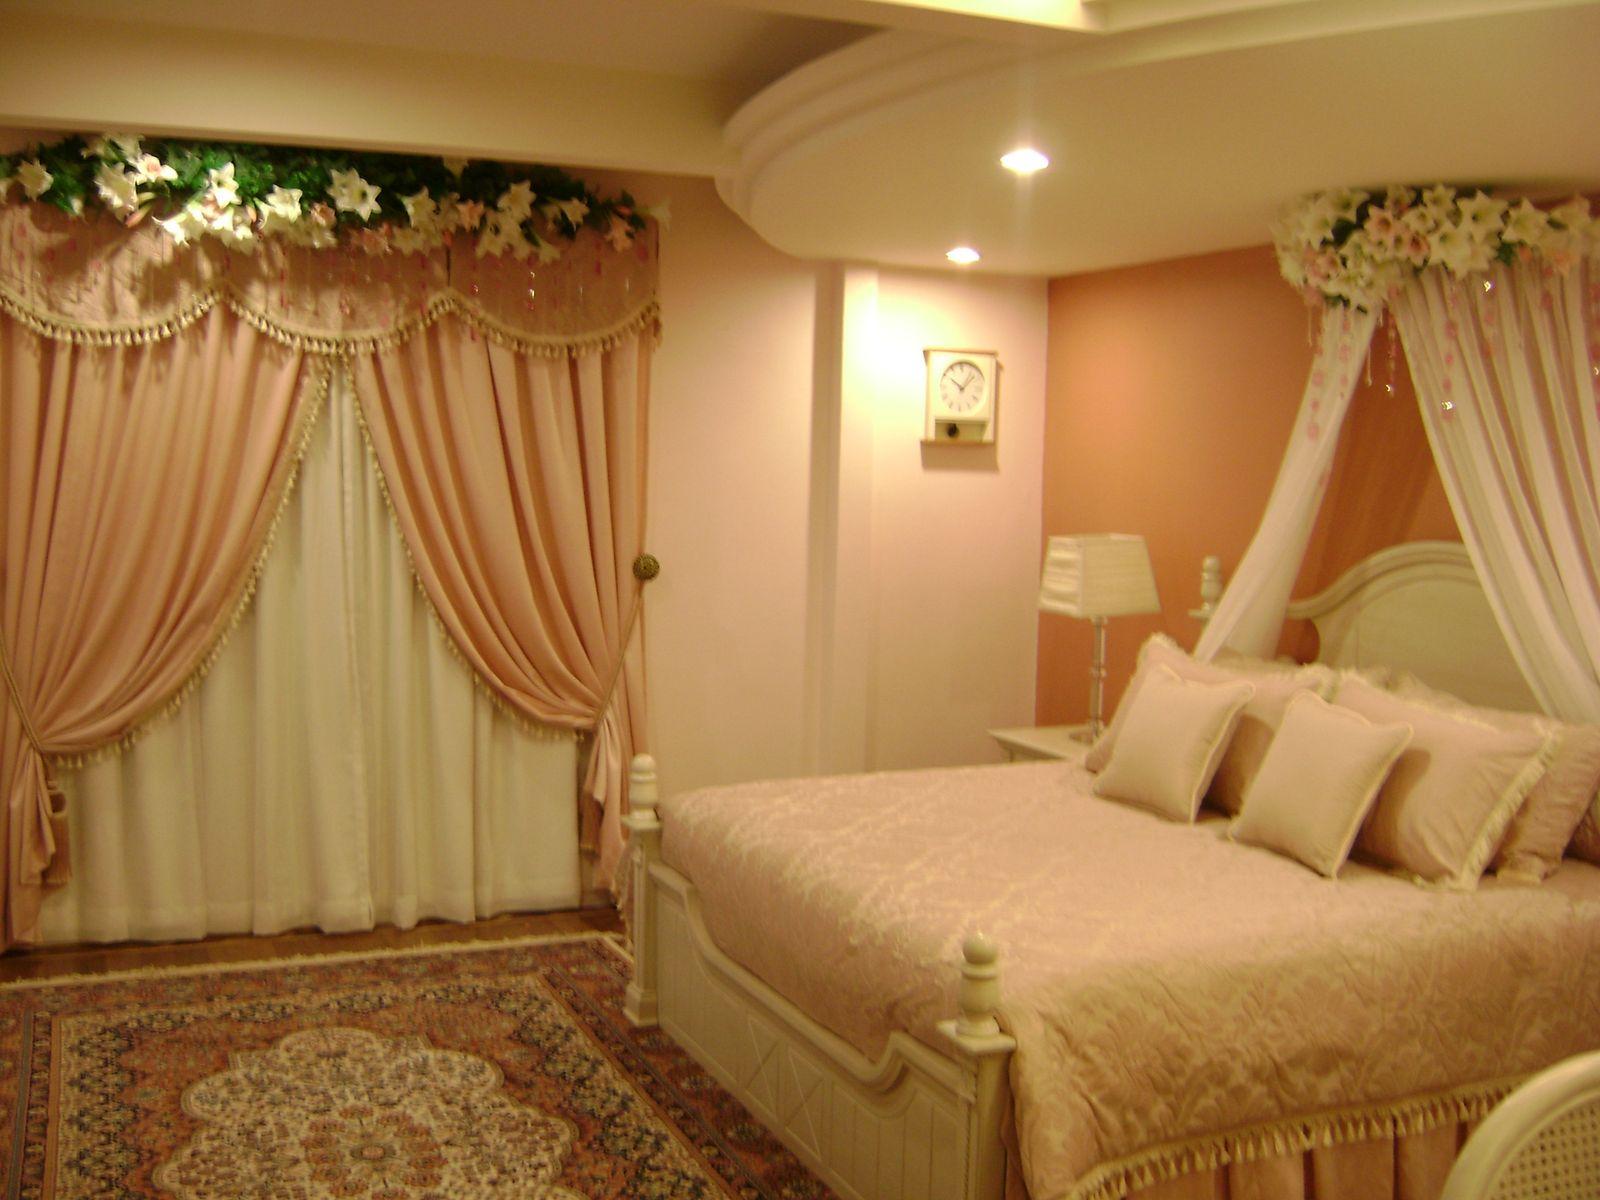 Bridal Room Decoration Photos